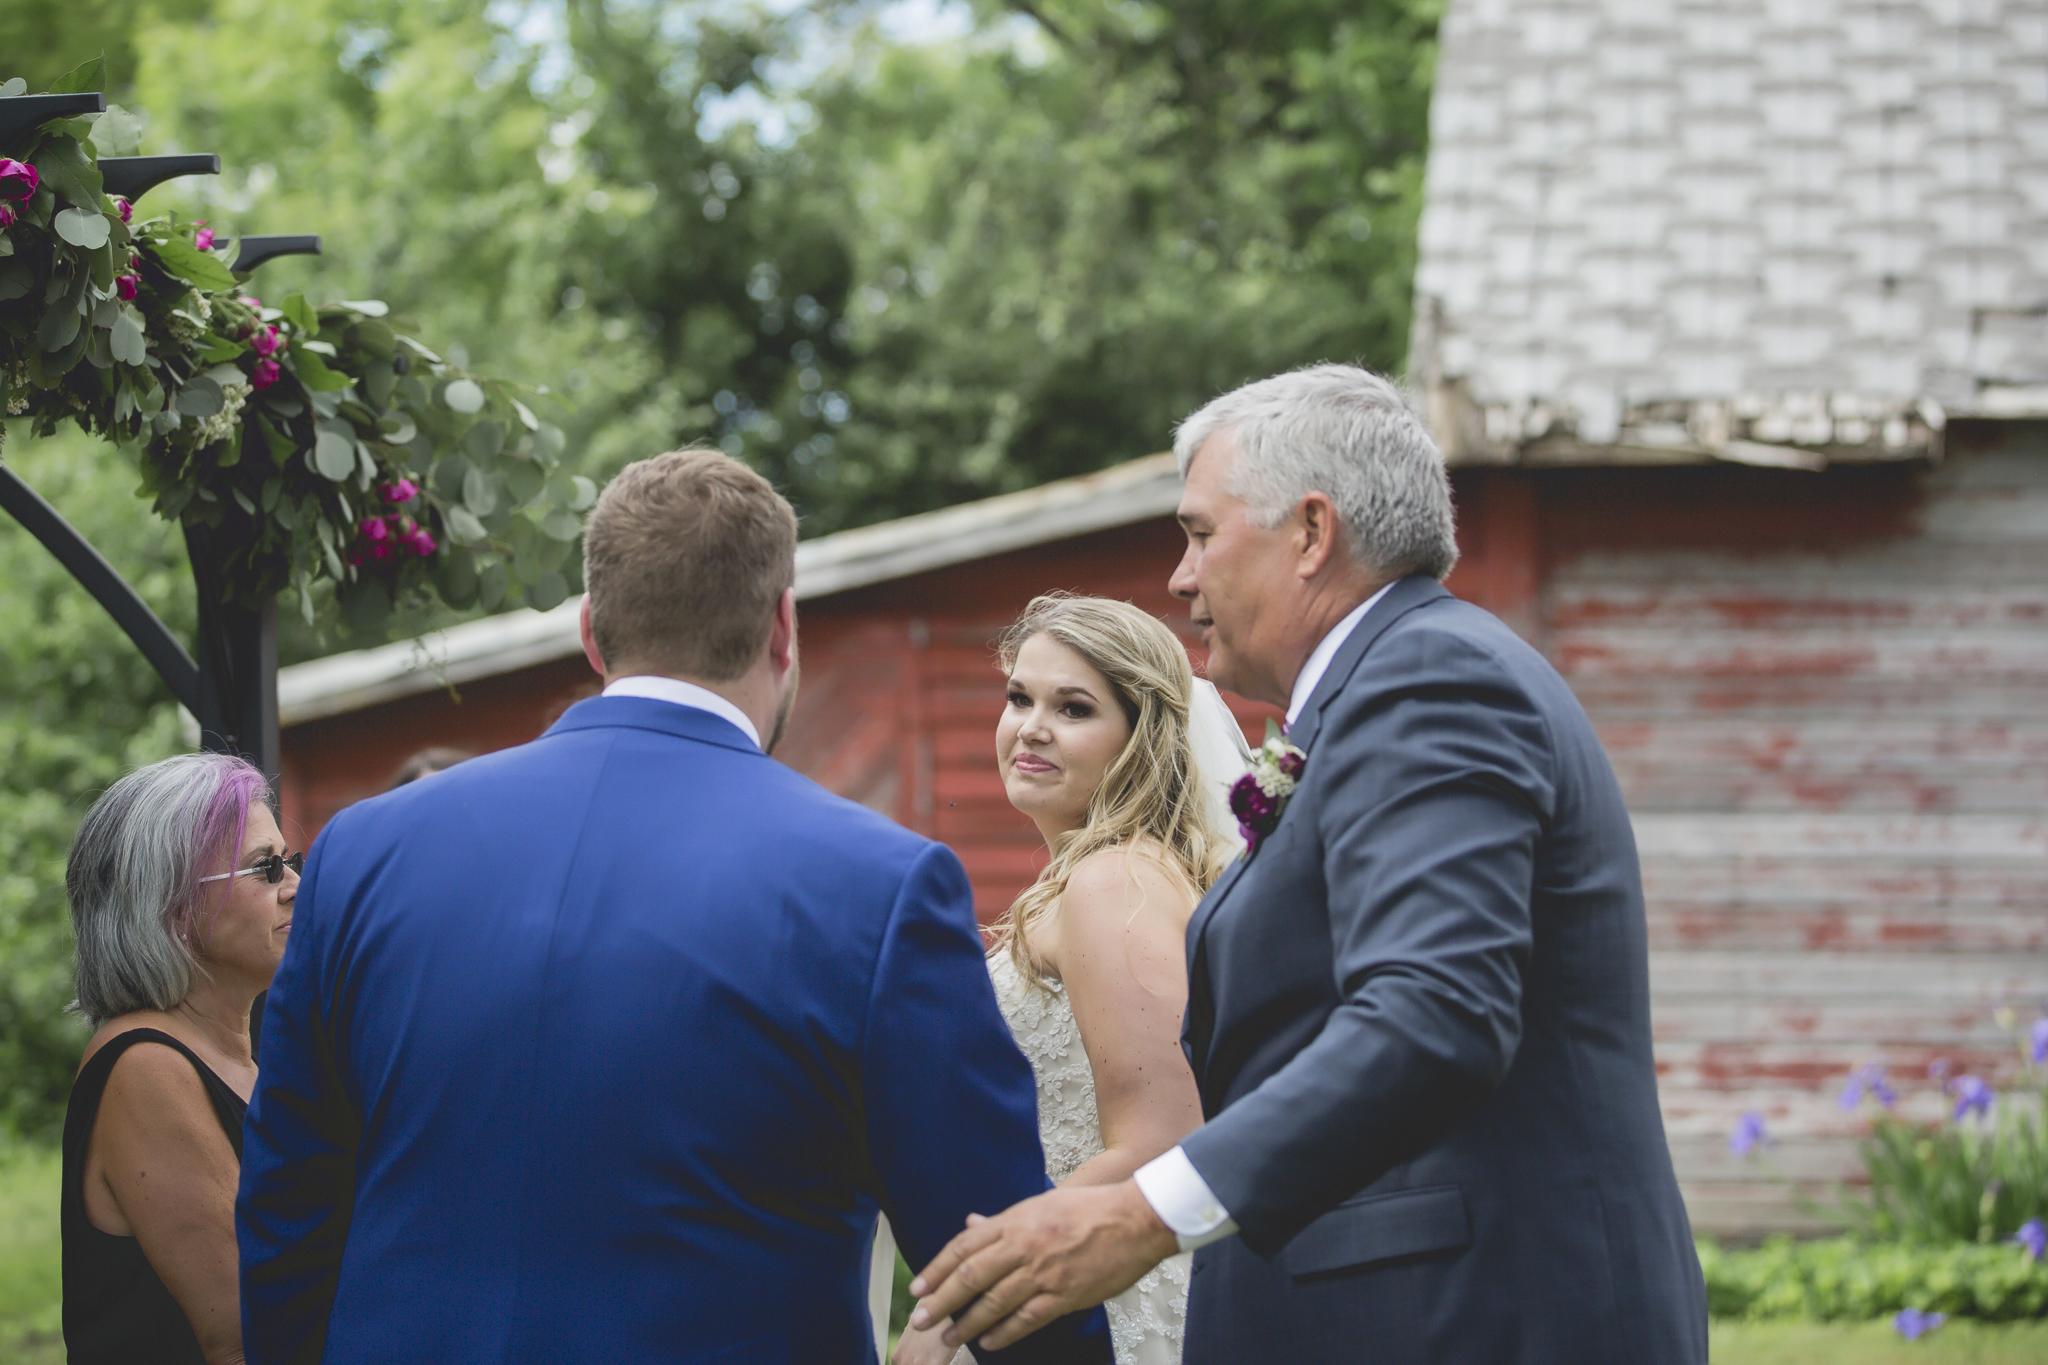 minnesota family farm outdoor wedding photographer-24.jpg